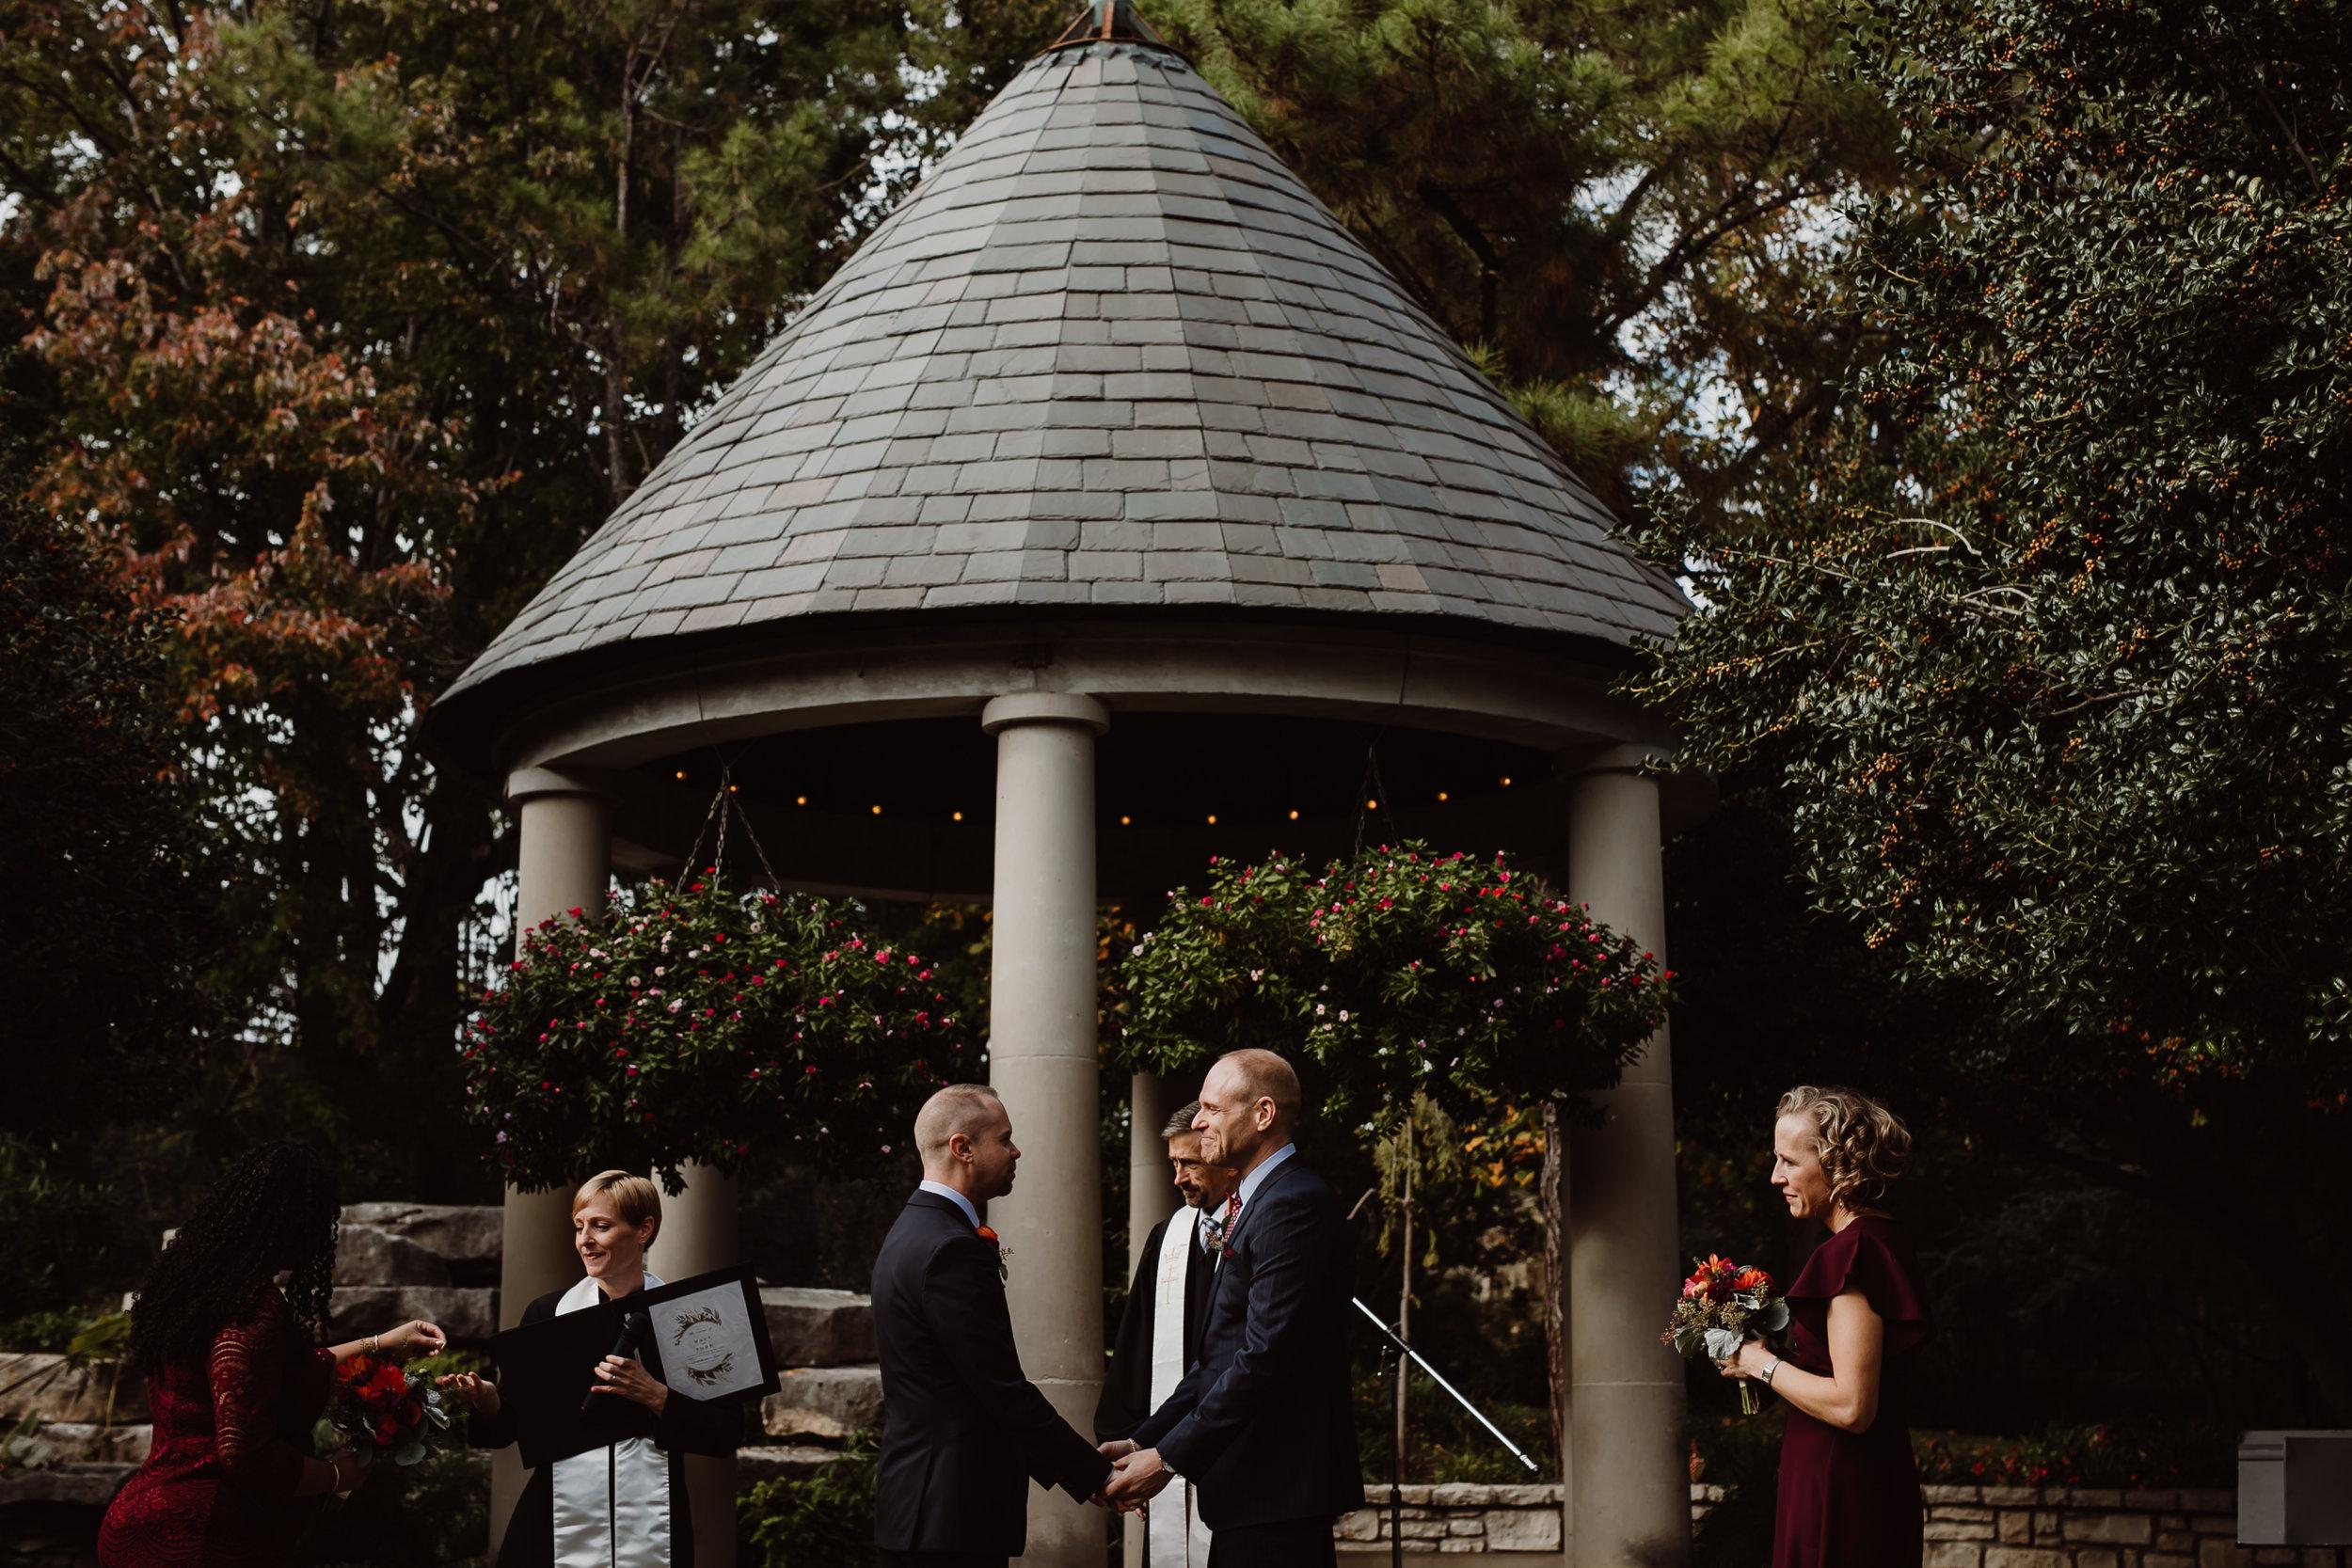 ftworth-botanical-gardens-wedding-M&T (320 of 548).jpg